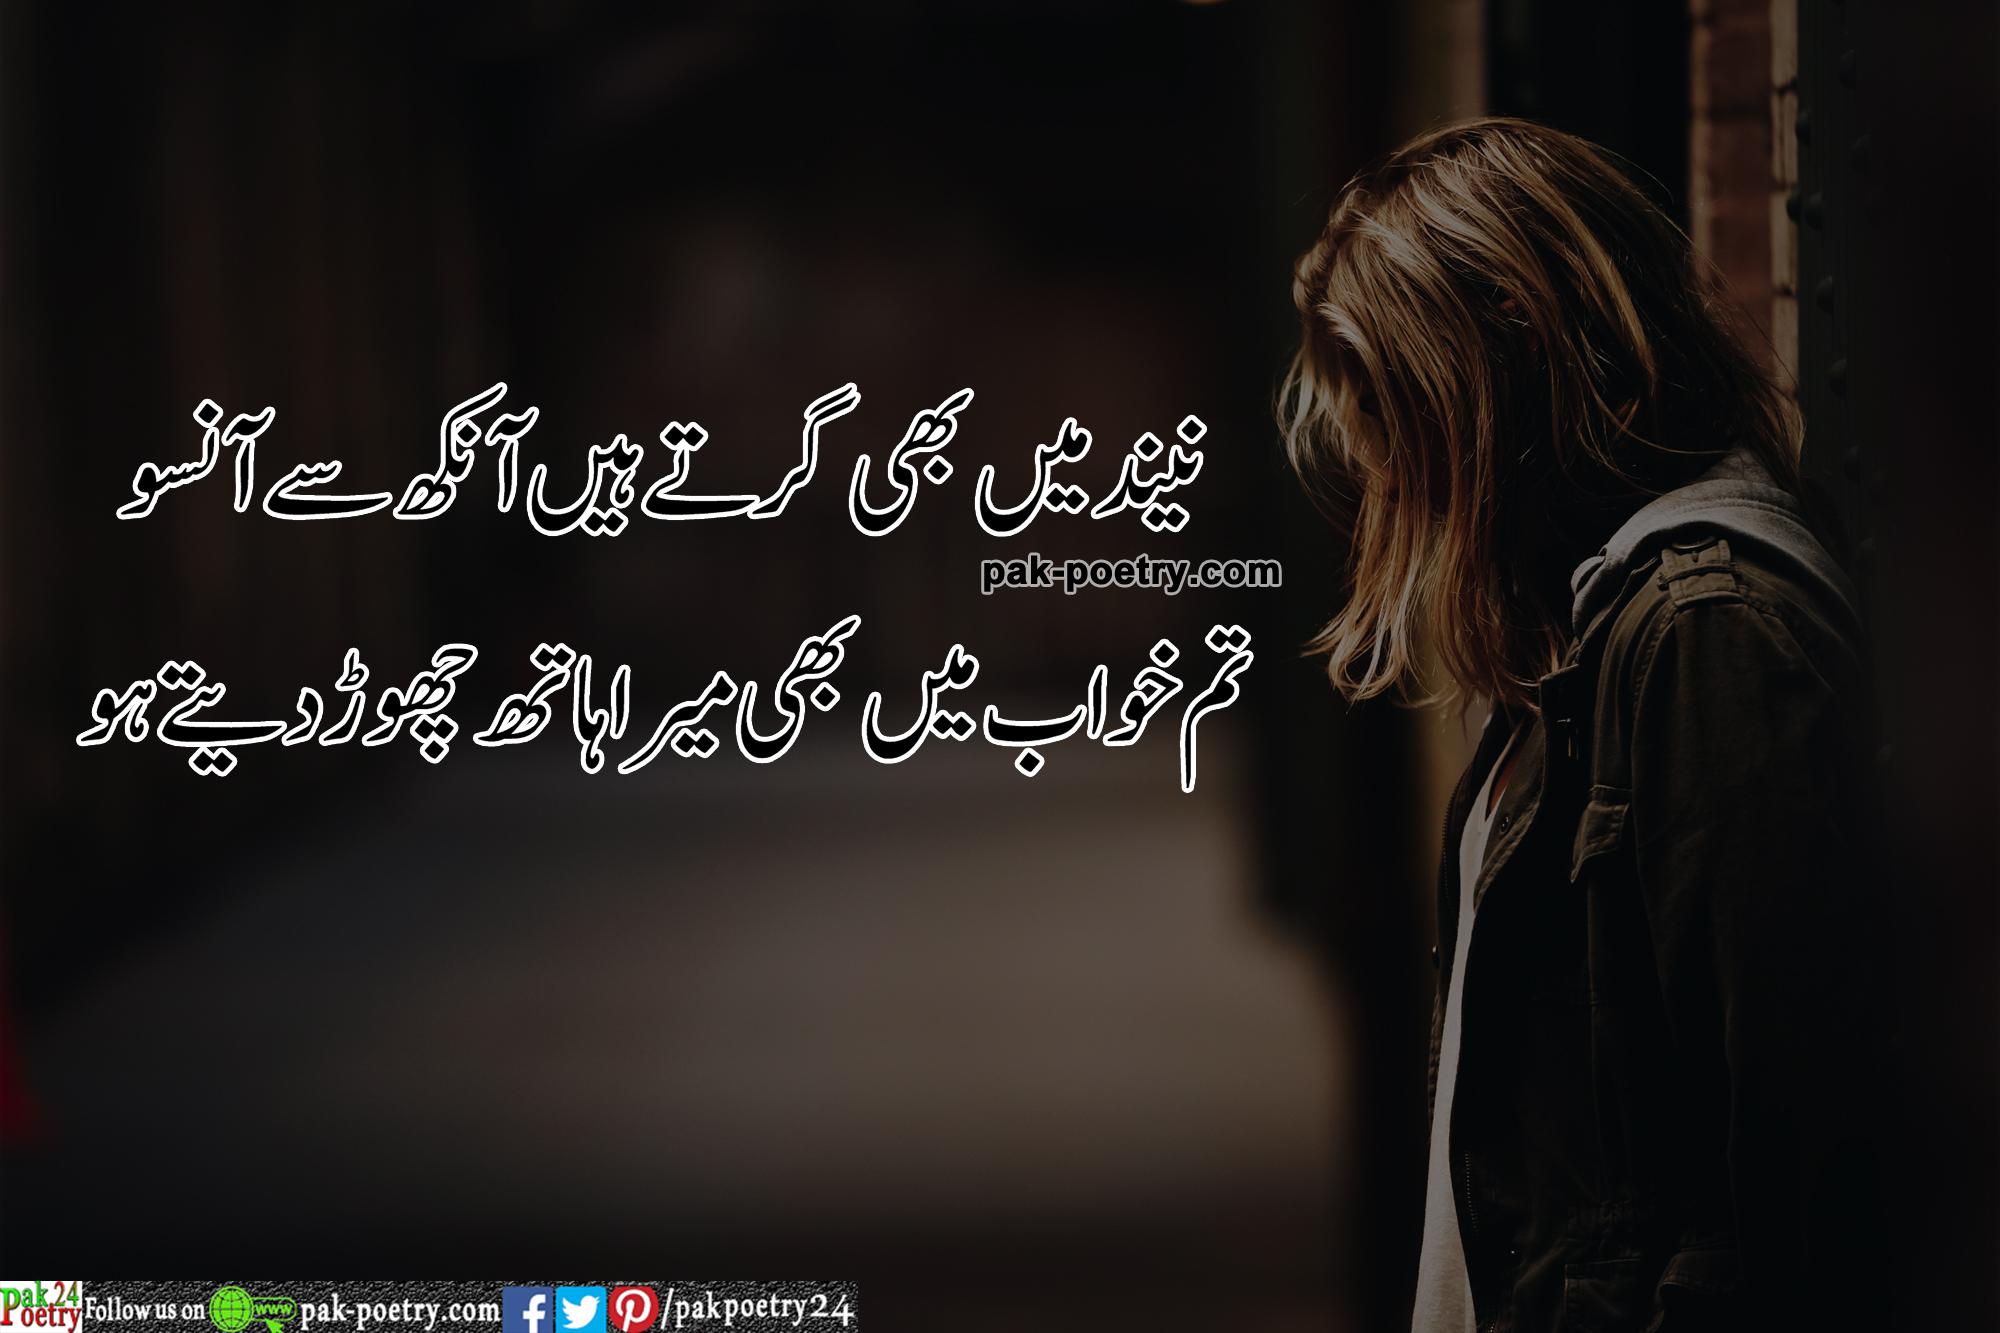 nend may bee gherty hain ankh sy ansoo - Sad Poetry